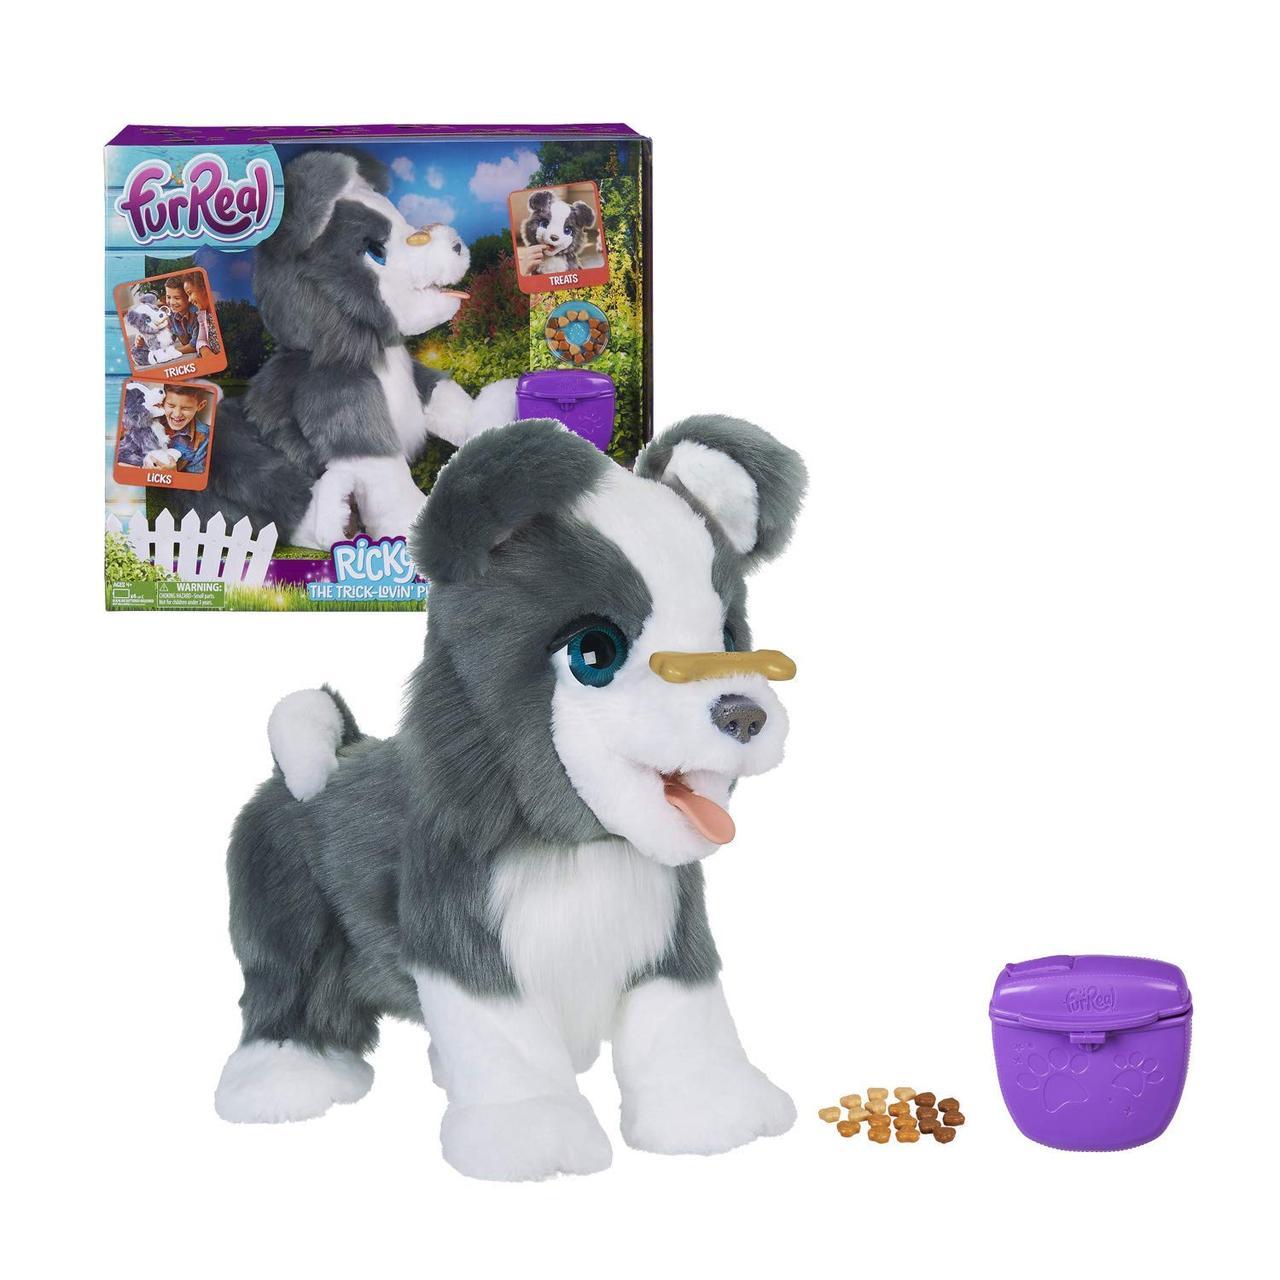 Интерактивный щенок, собака Рики, Ricky Trick FurReal Friends, Hasbro Оригинал из США